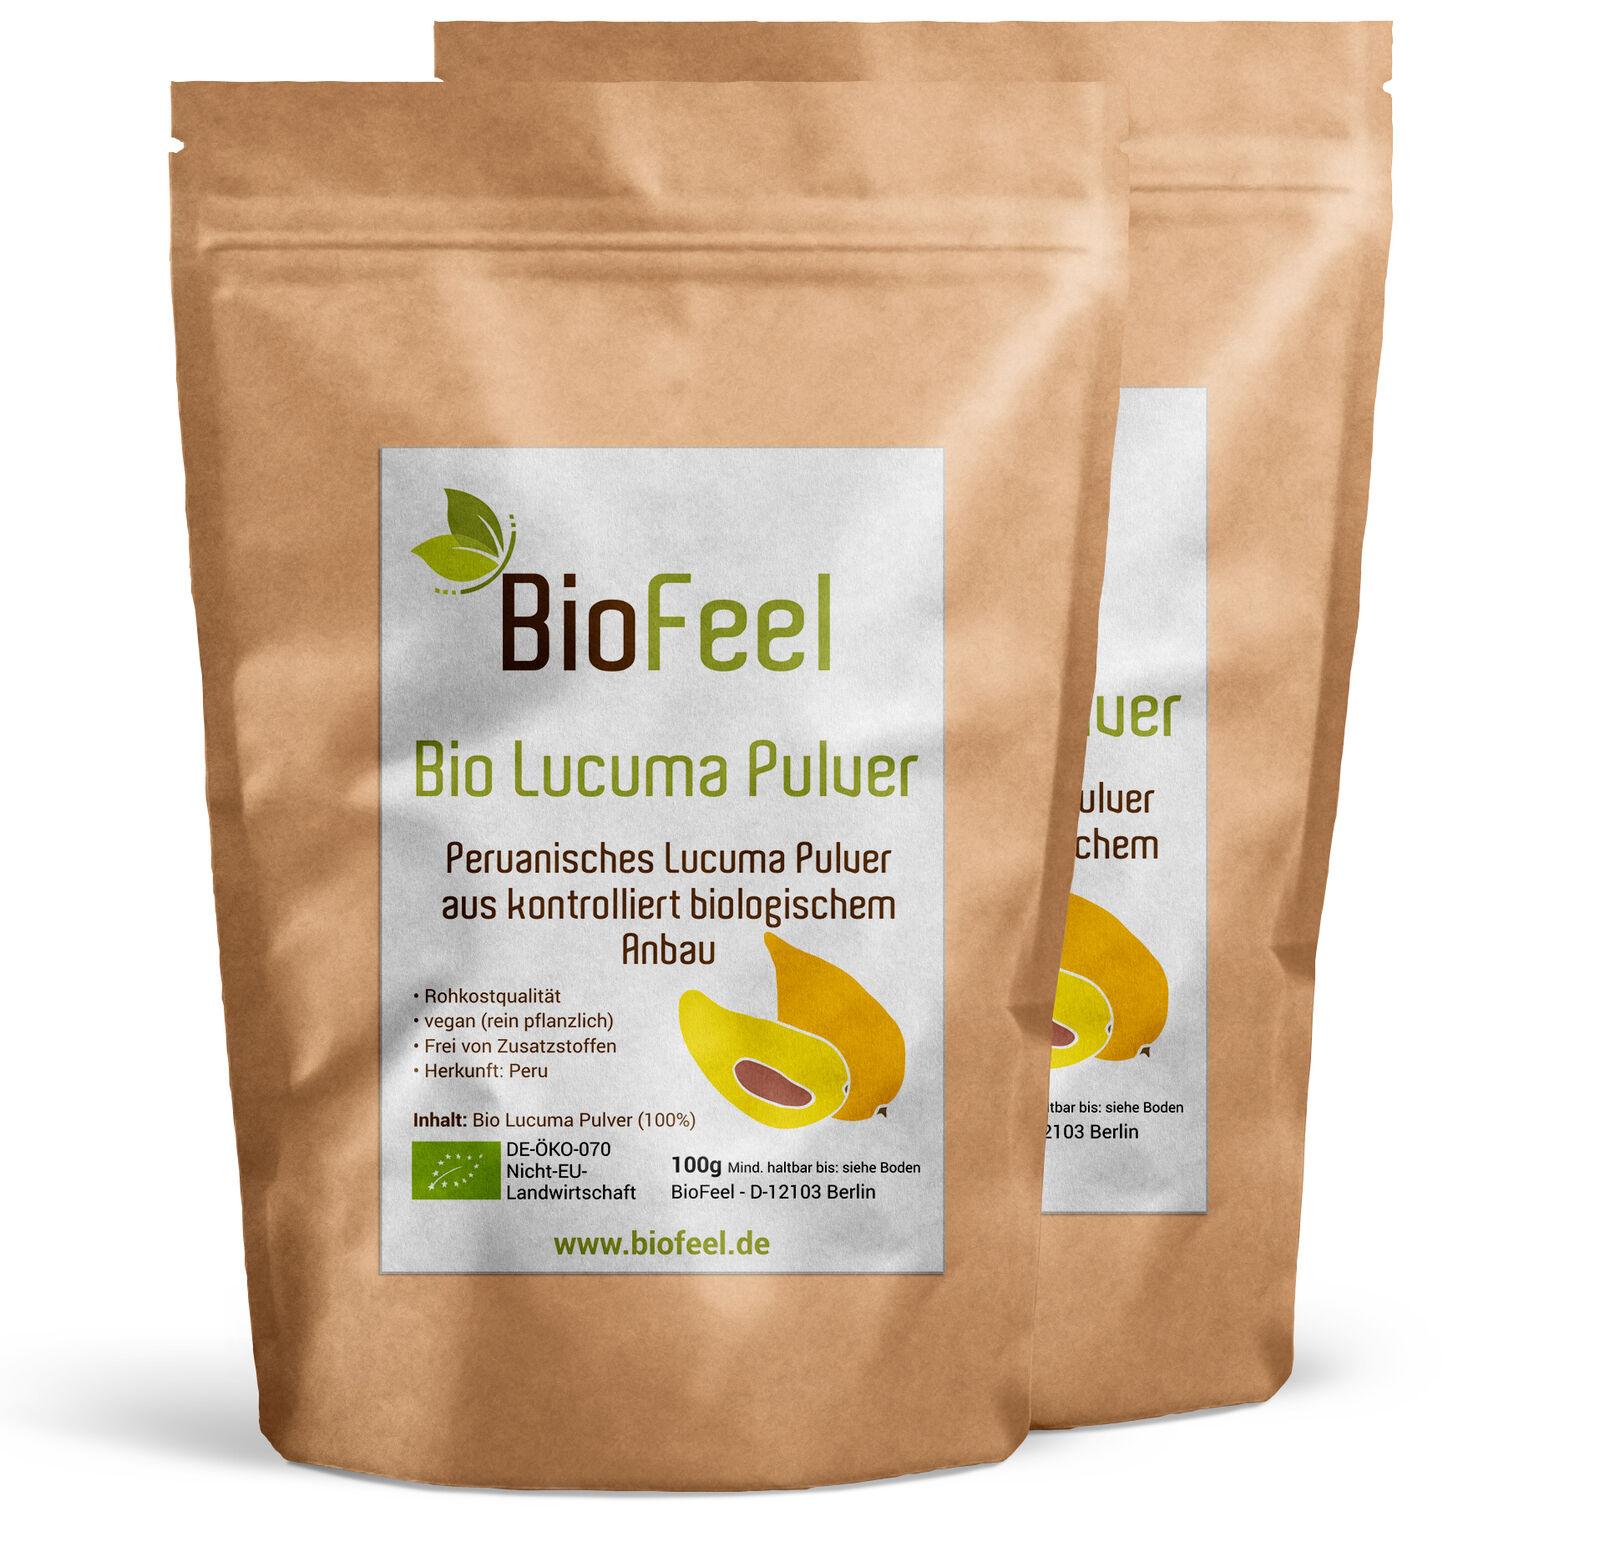 BioFeel - Bio Lucuma Pulver, 200g (2x 100g)